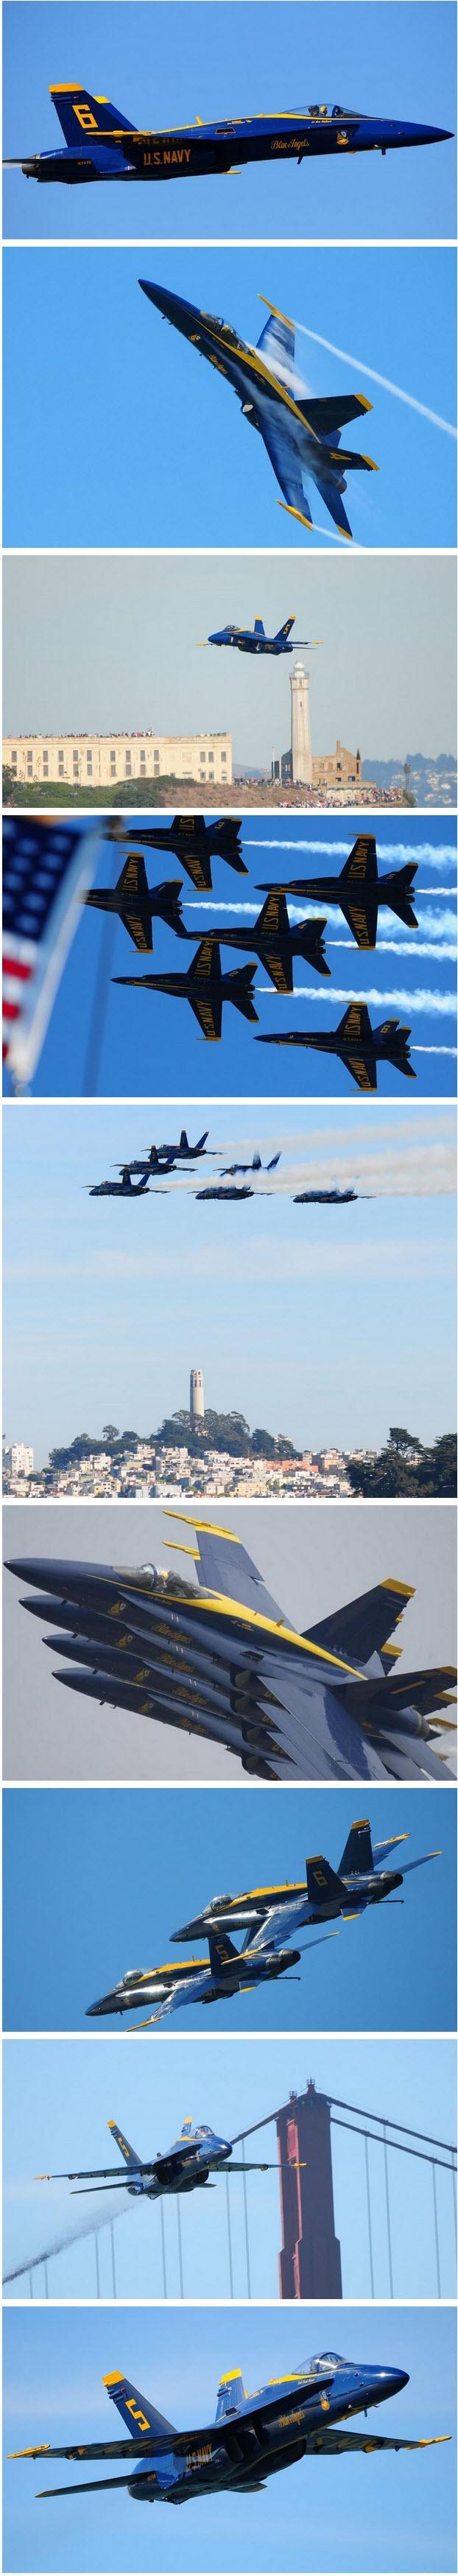 U.S. Navy Blue Angels (jets)